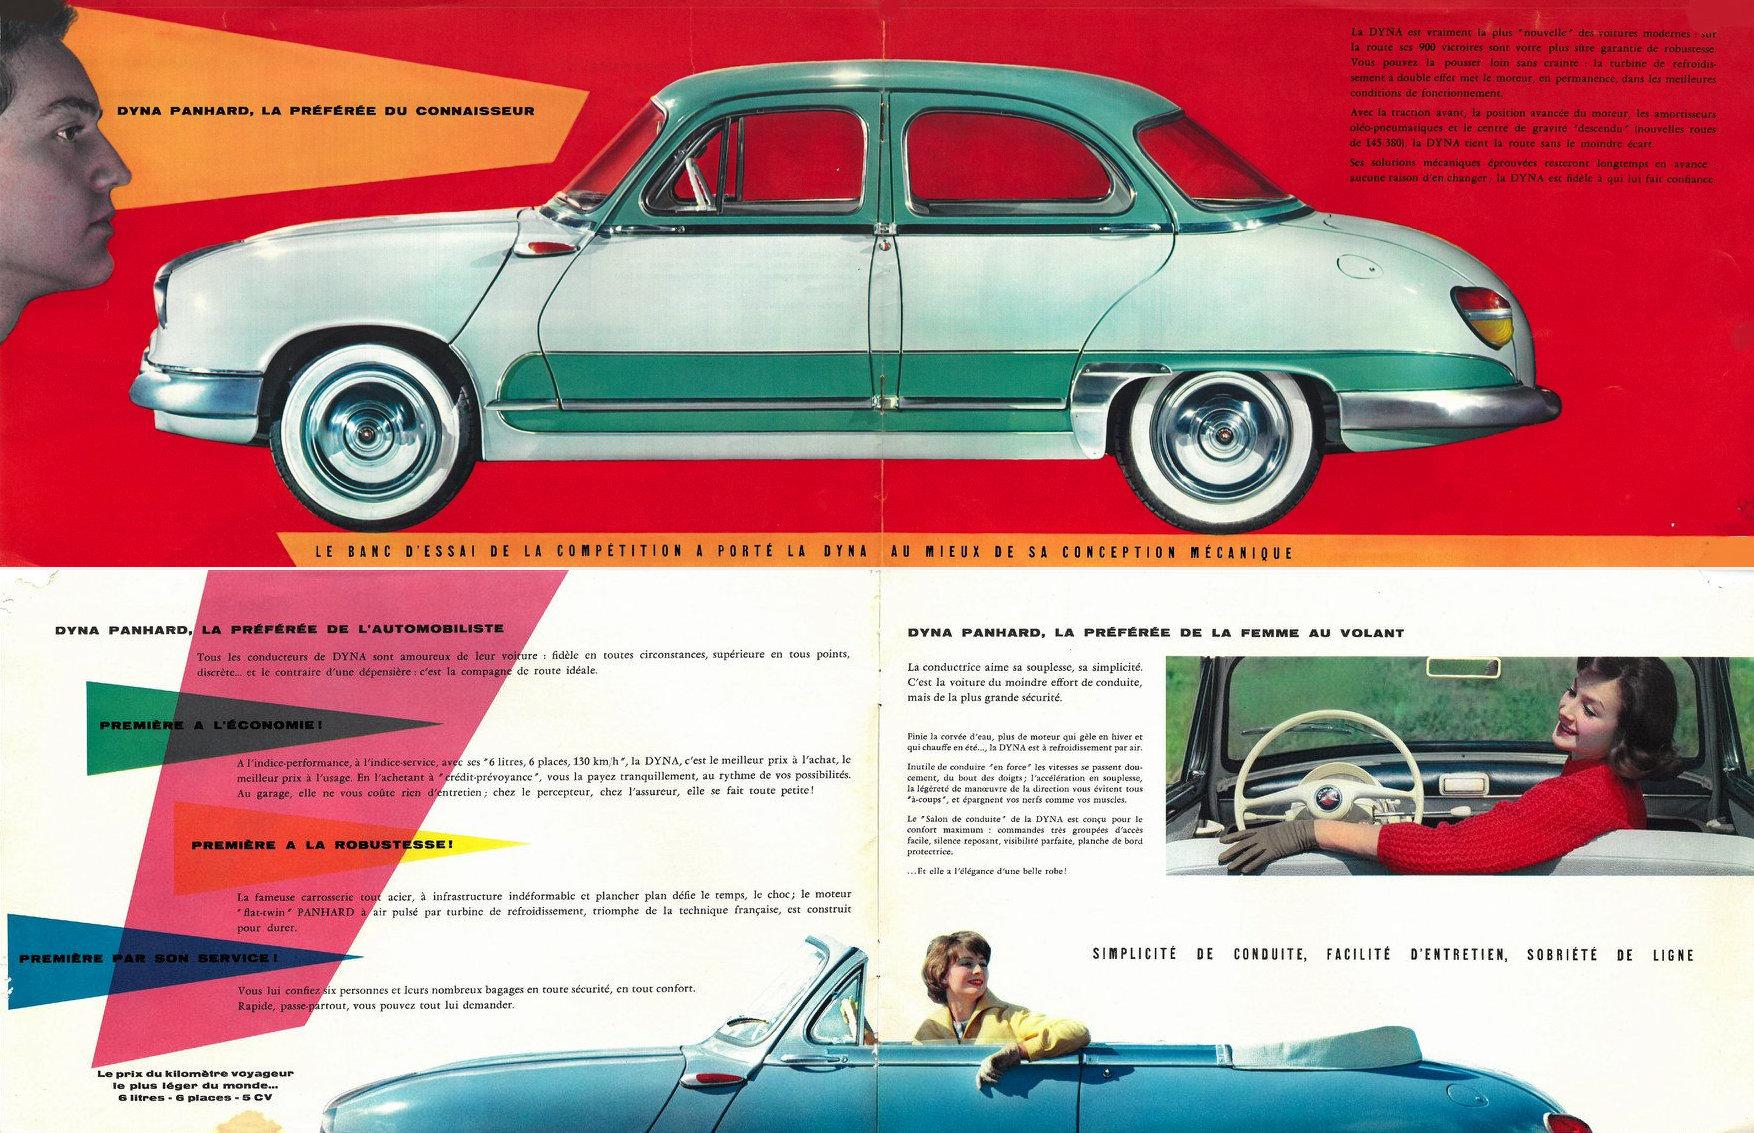 Panhard Dyna Z Brochure 1960 - 4